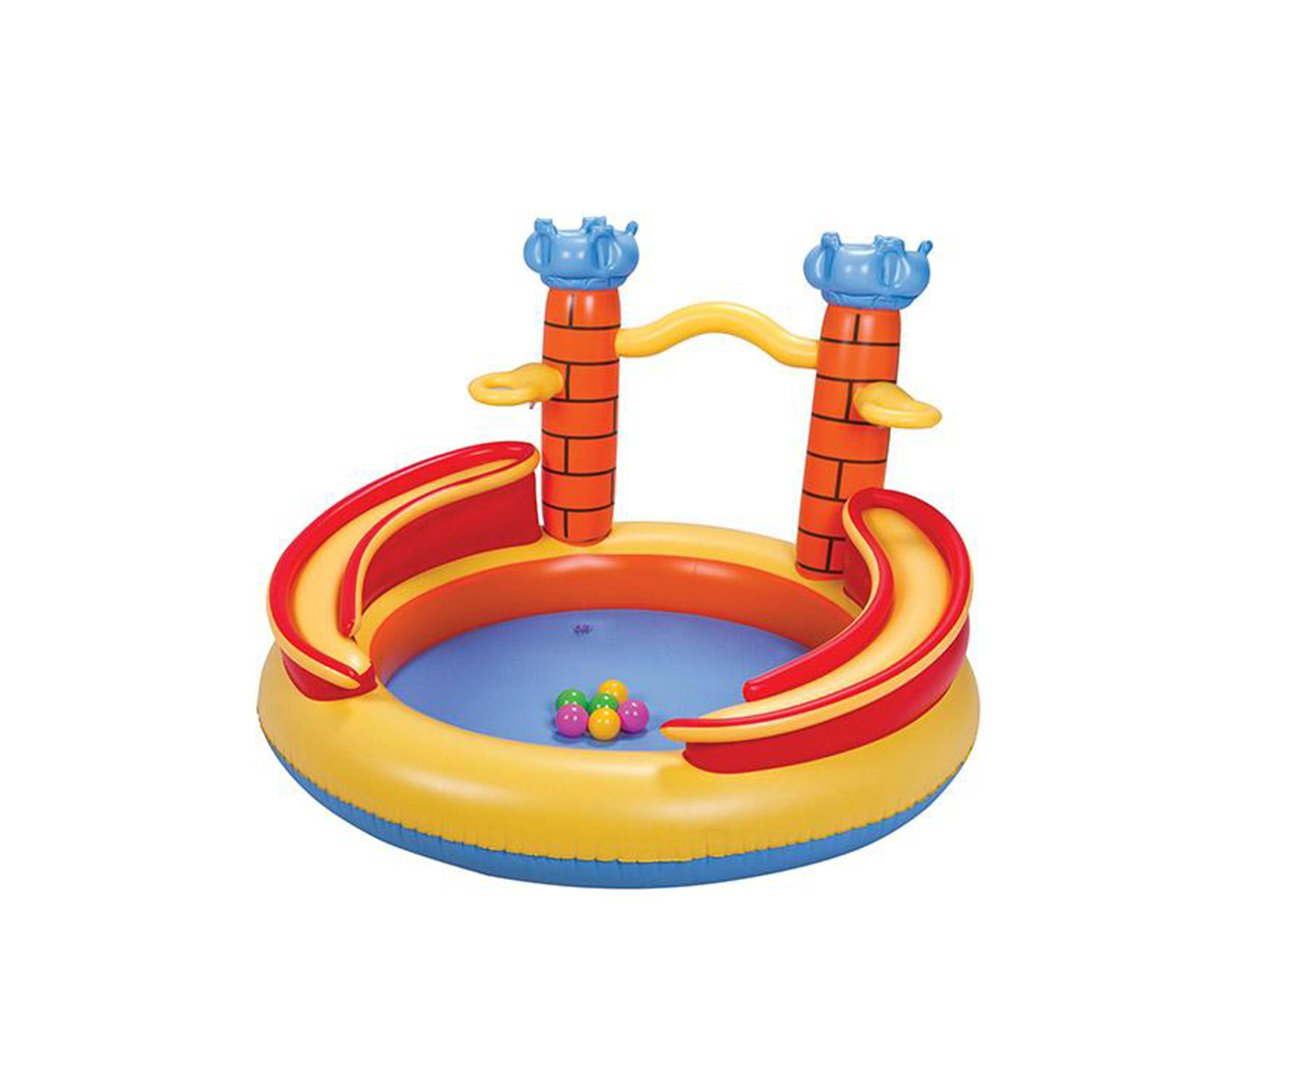 Playground Castelo Inflavel - Mor